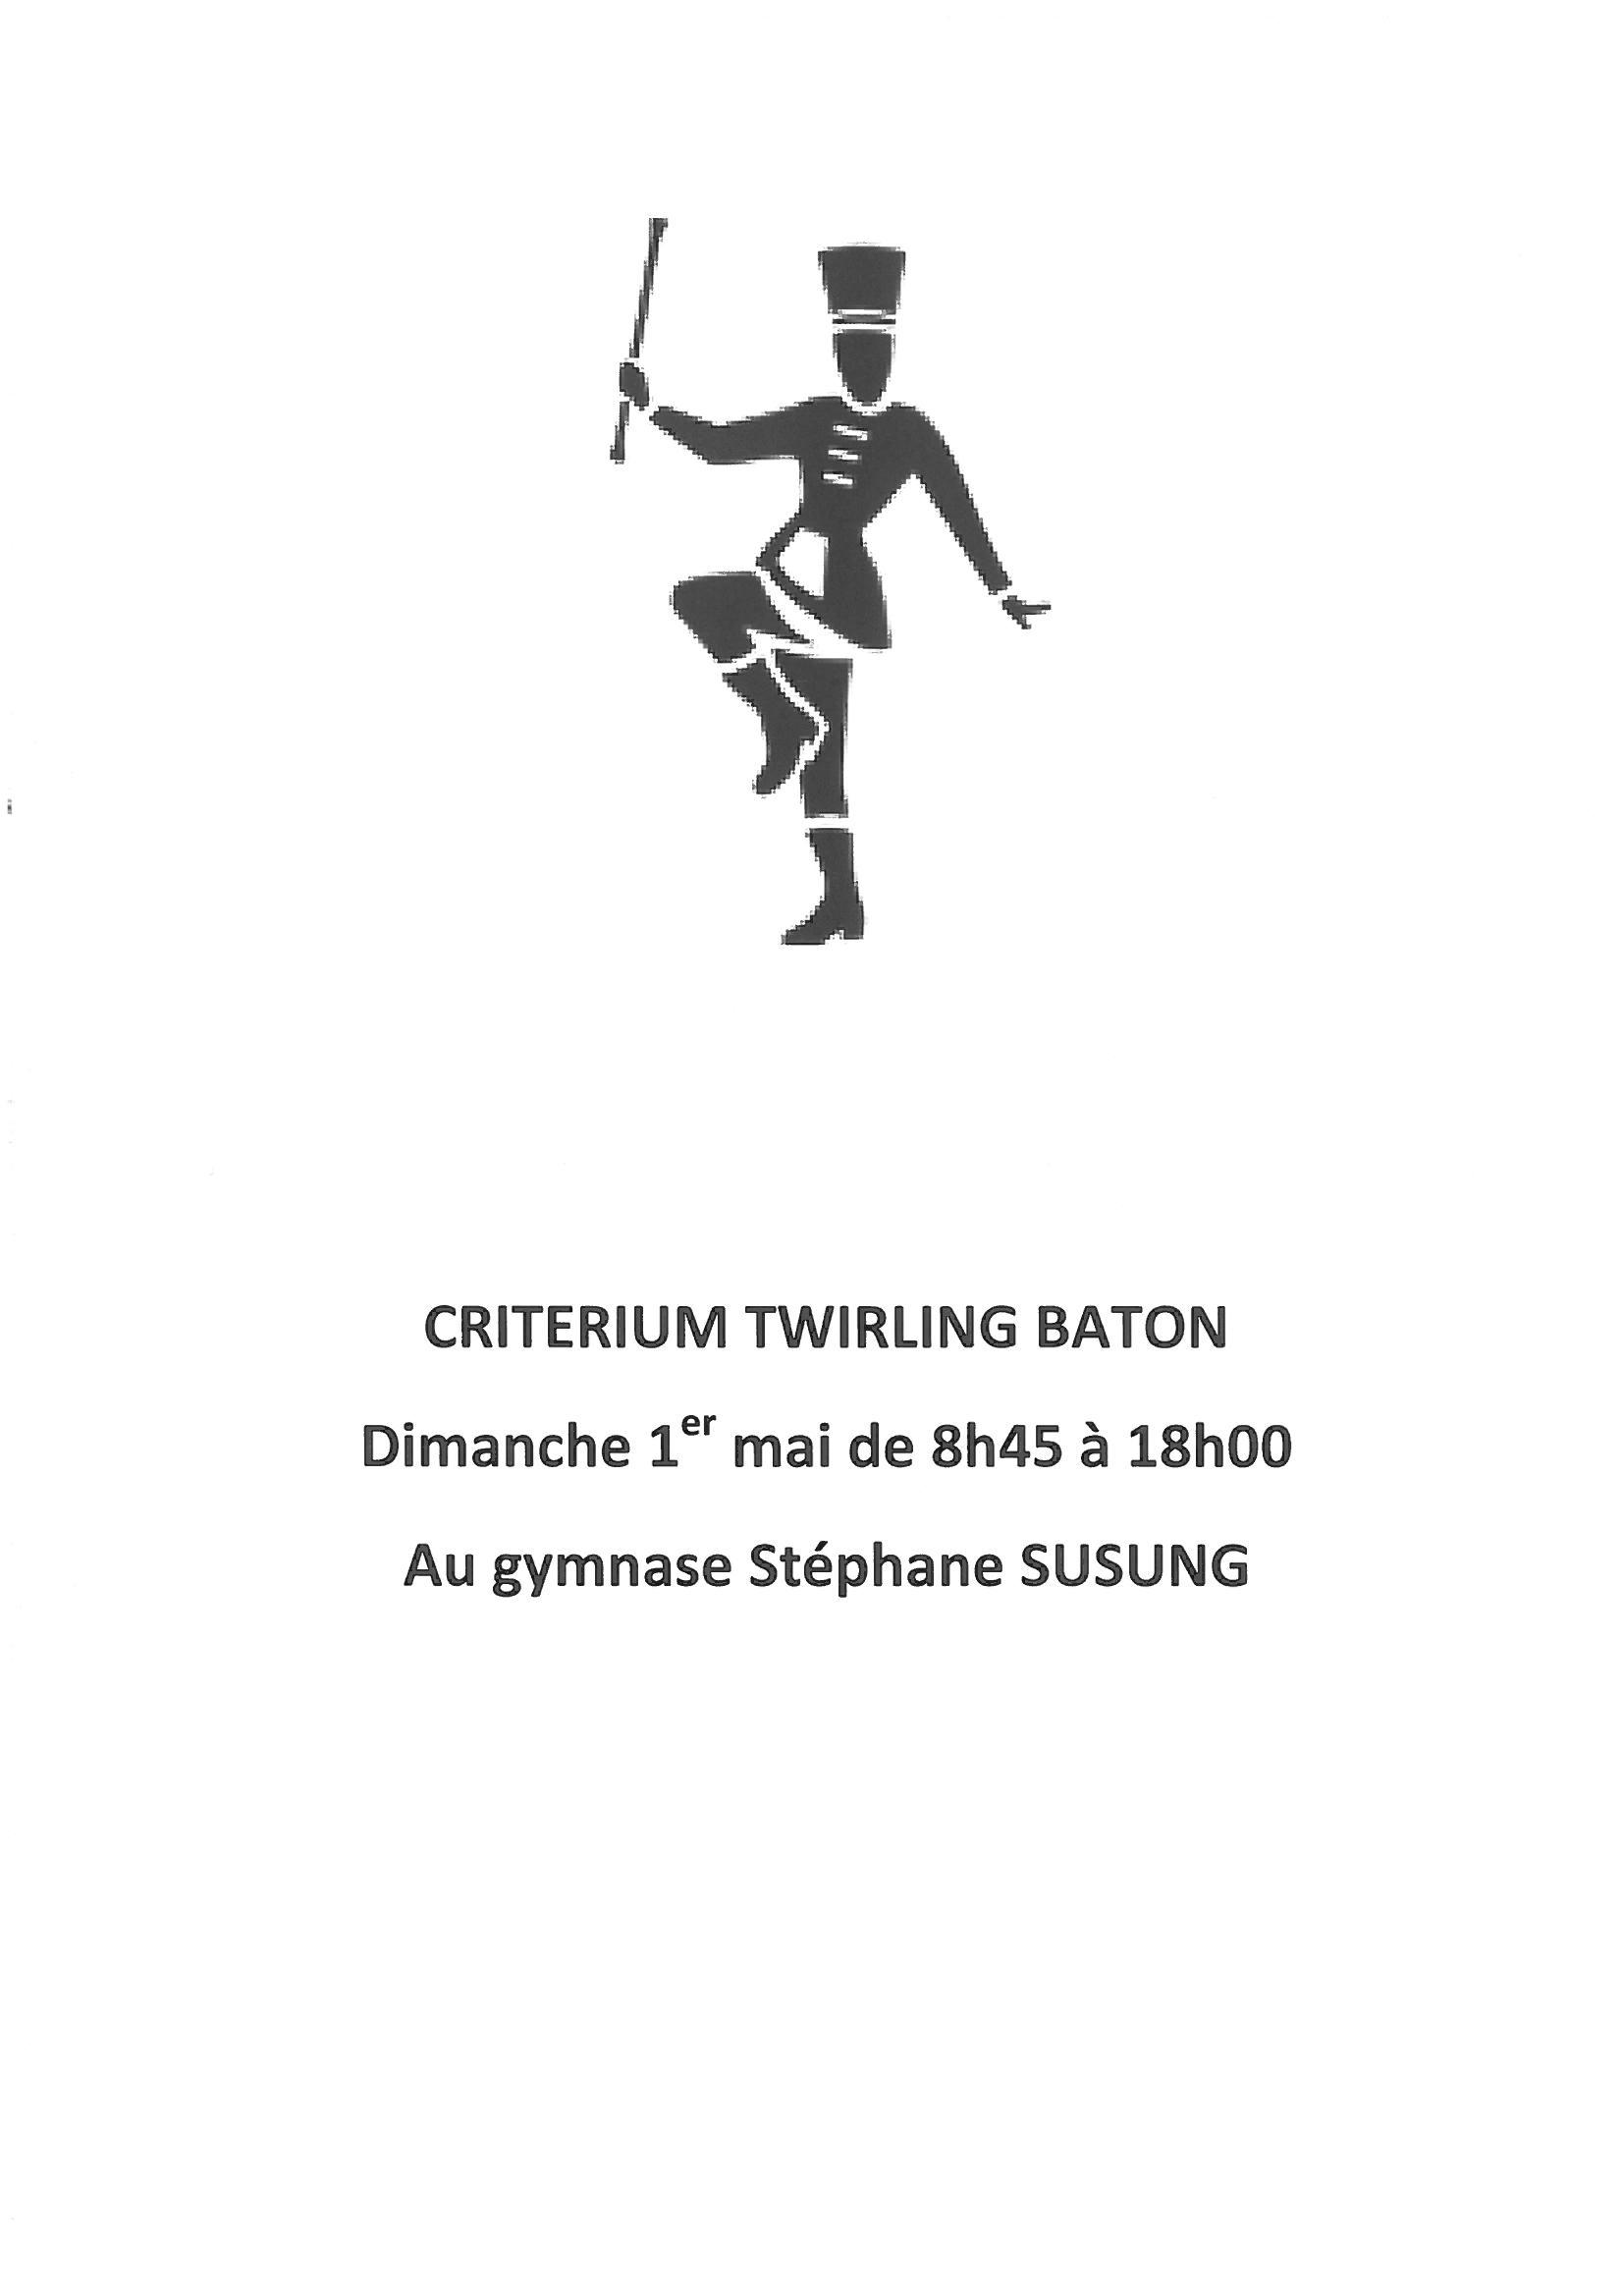 CRITERIUM TWIRLING BATON dimanche 1er mai